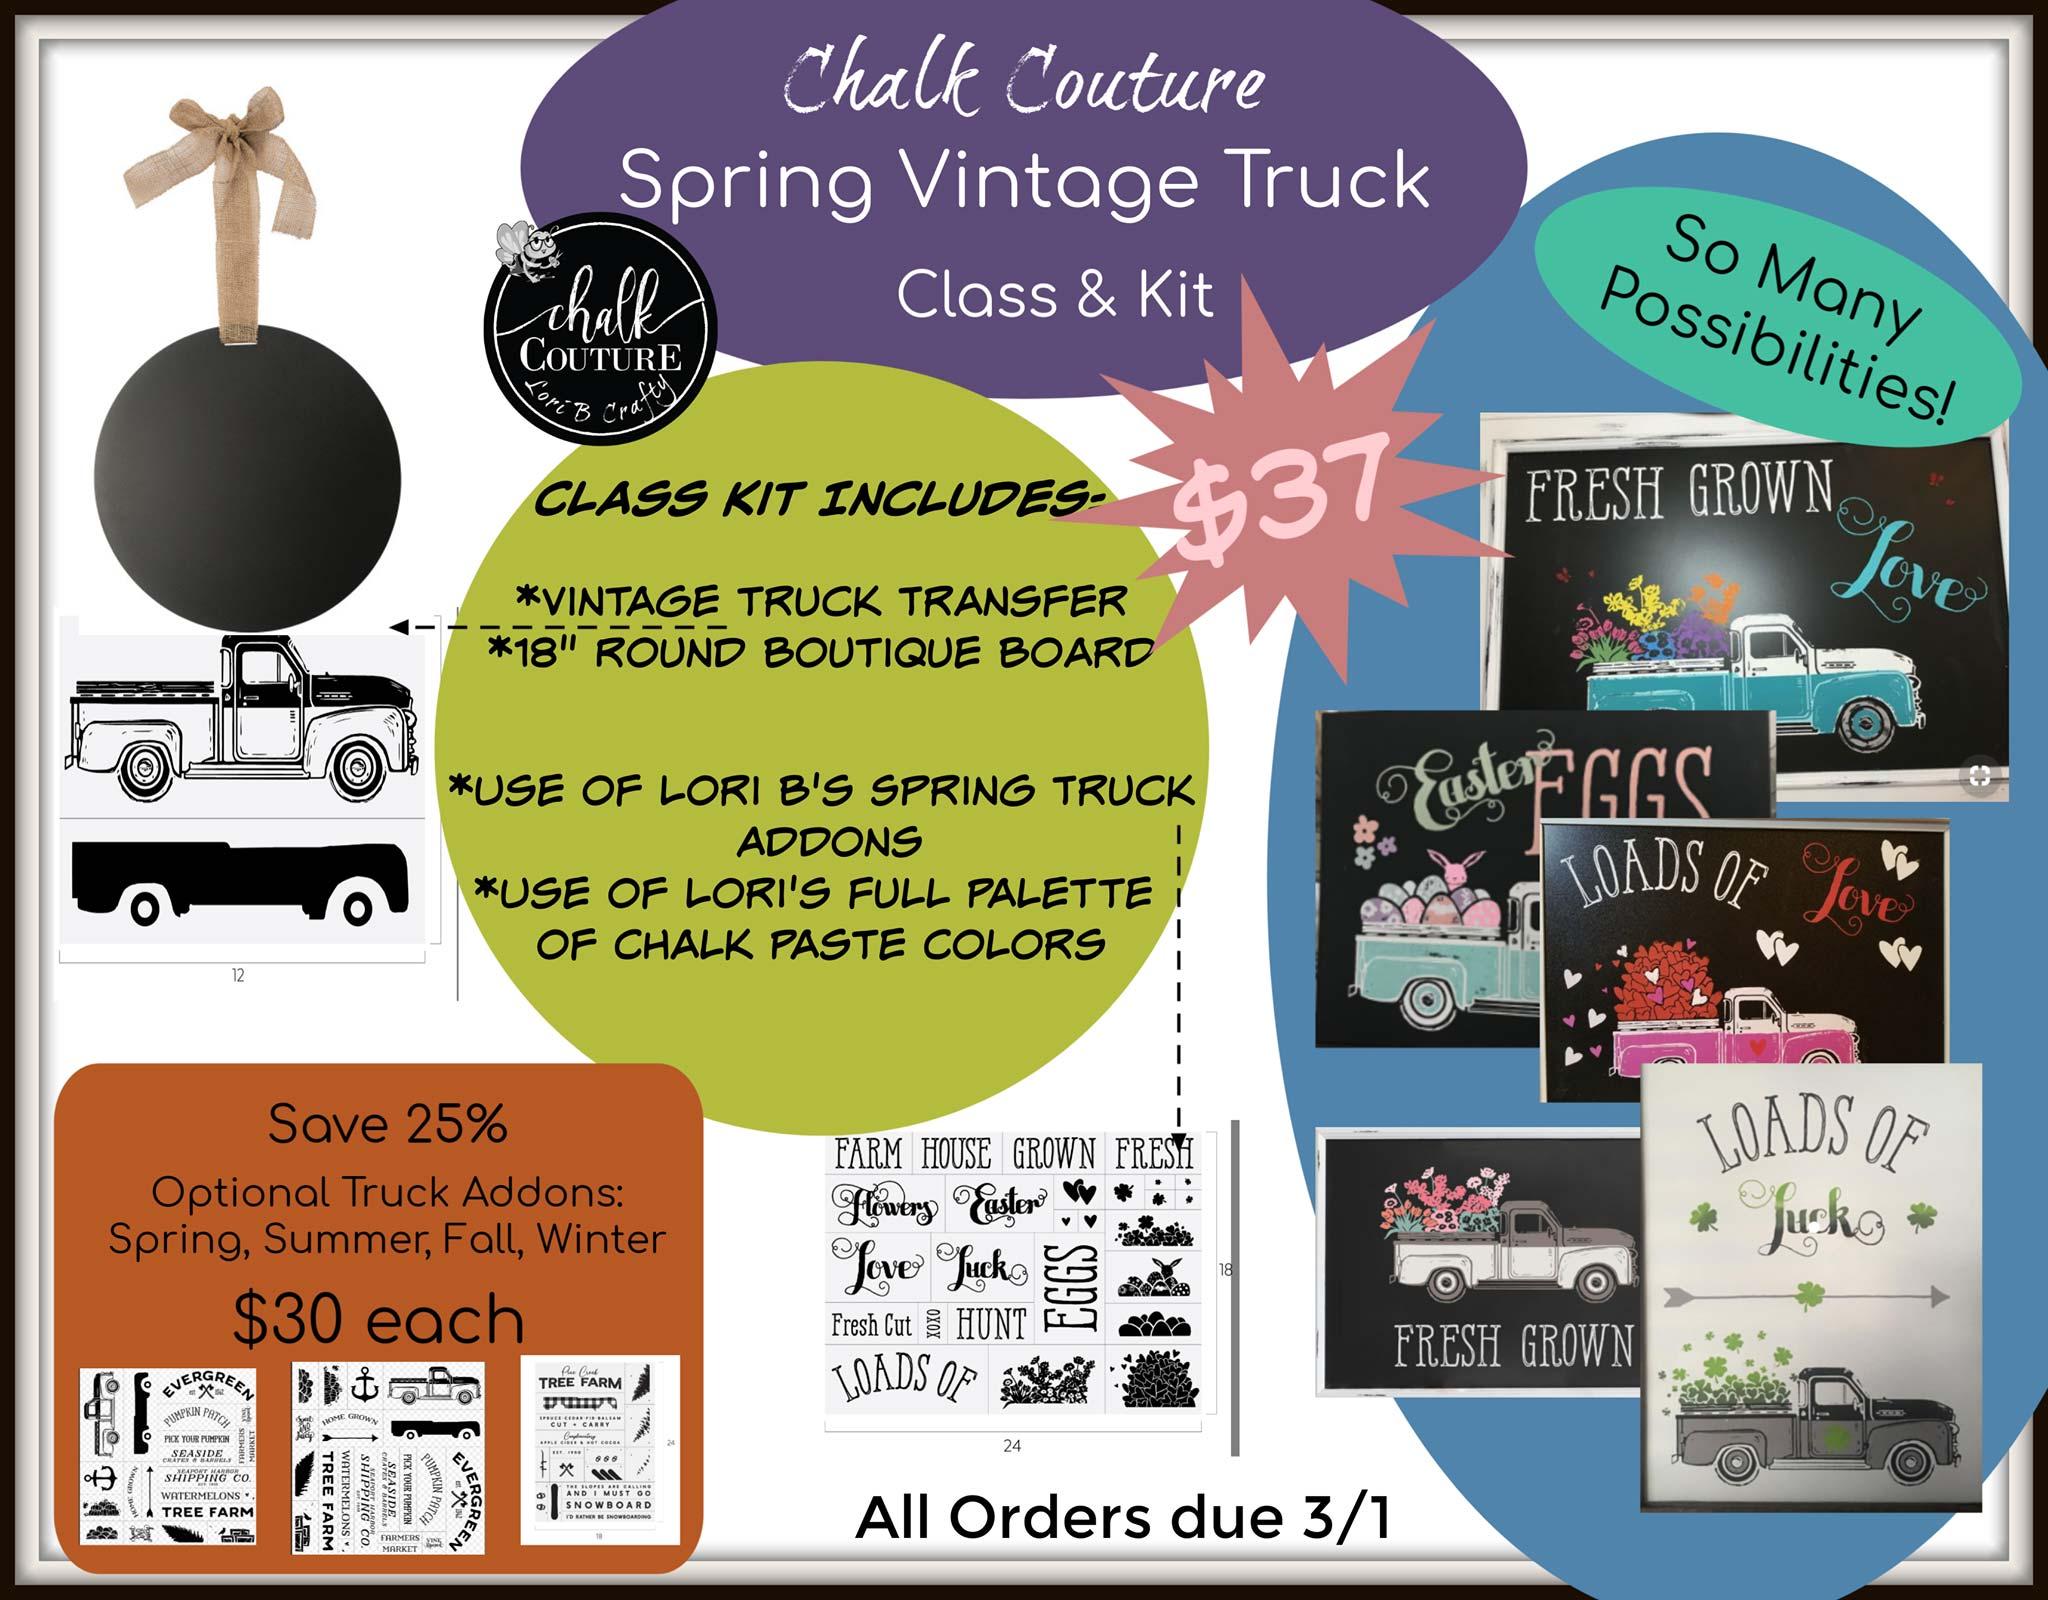 Chalk Couture – Vintage Truck Class